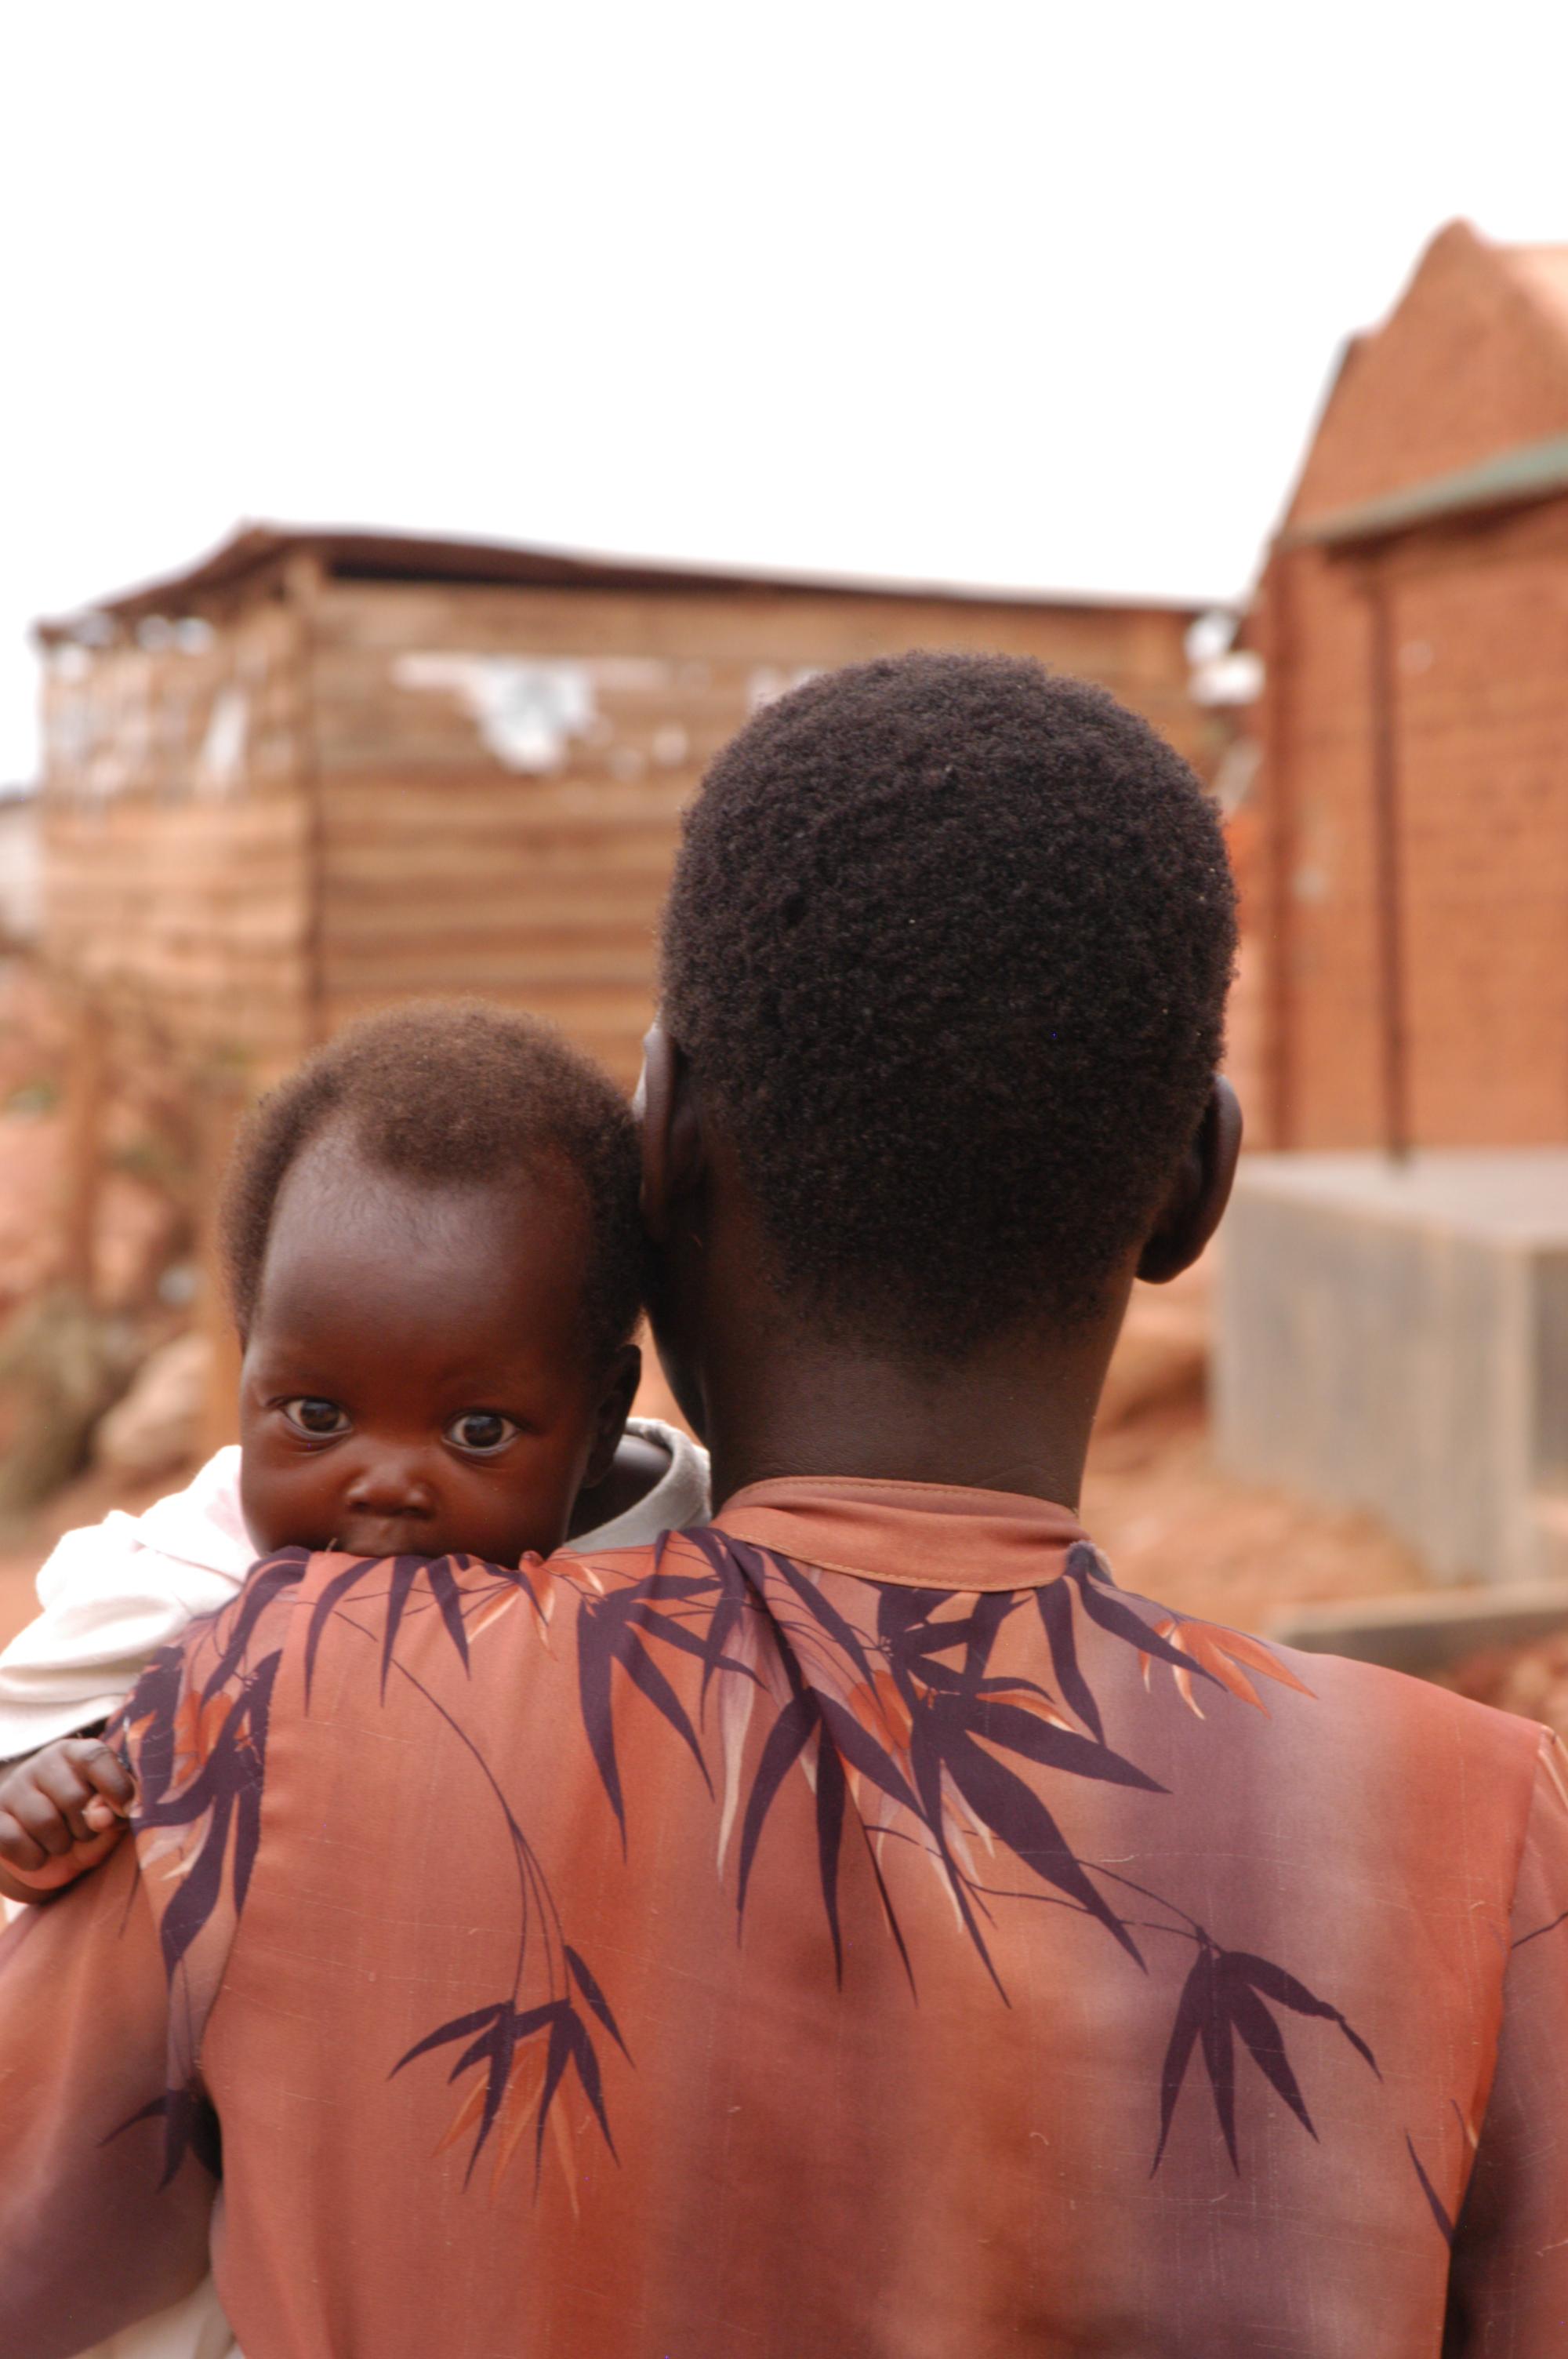 Acholi child with mother in Kampala, Uganda slum